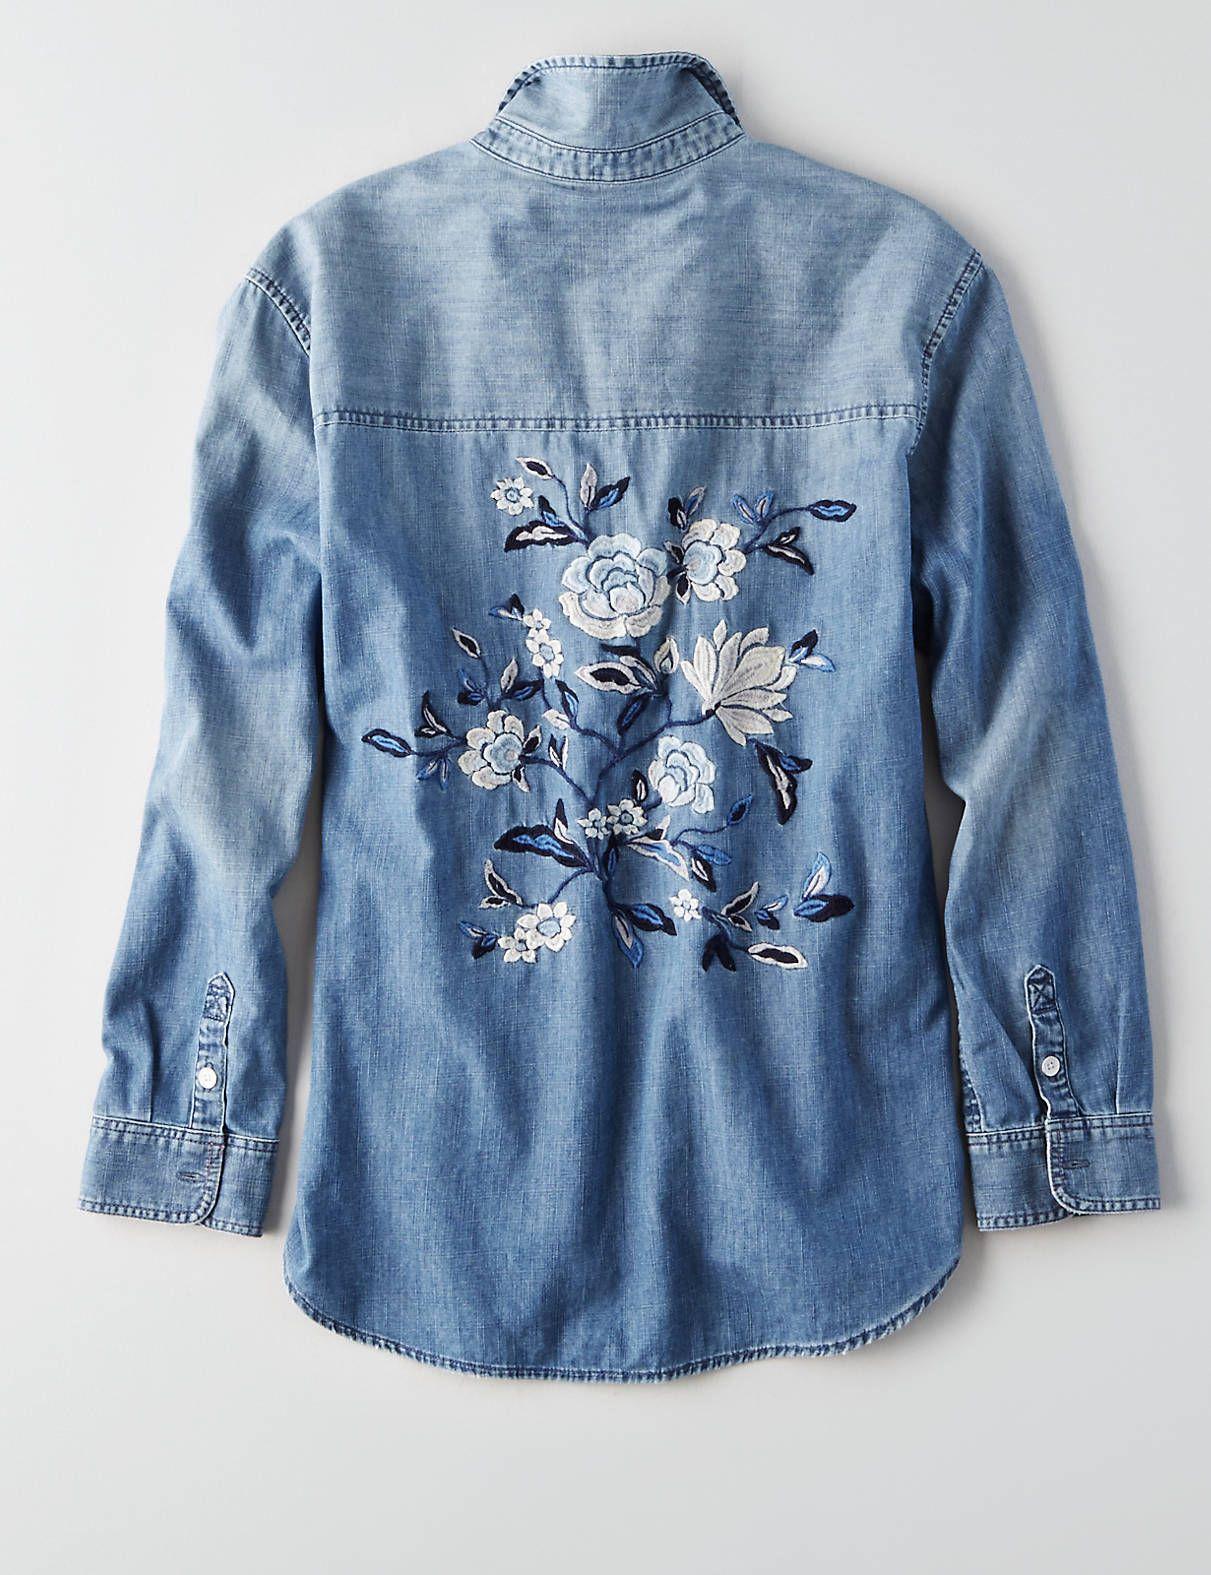 85e5fcd133 AEO Embroidered Denim Shirt